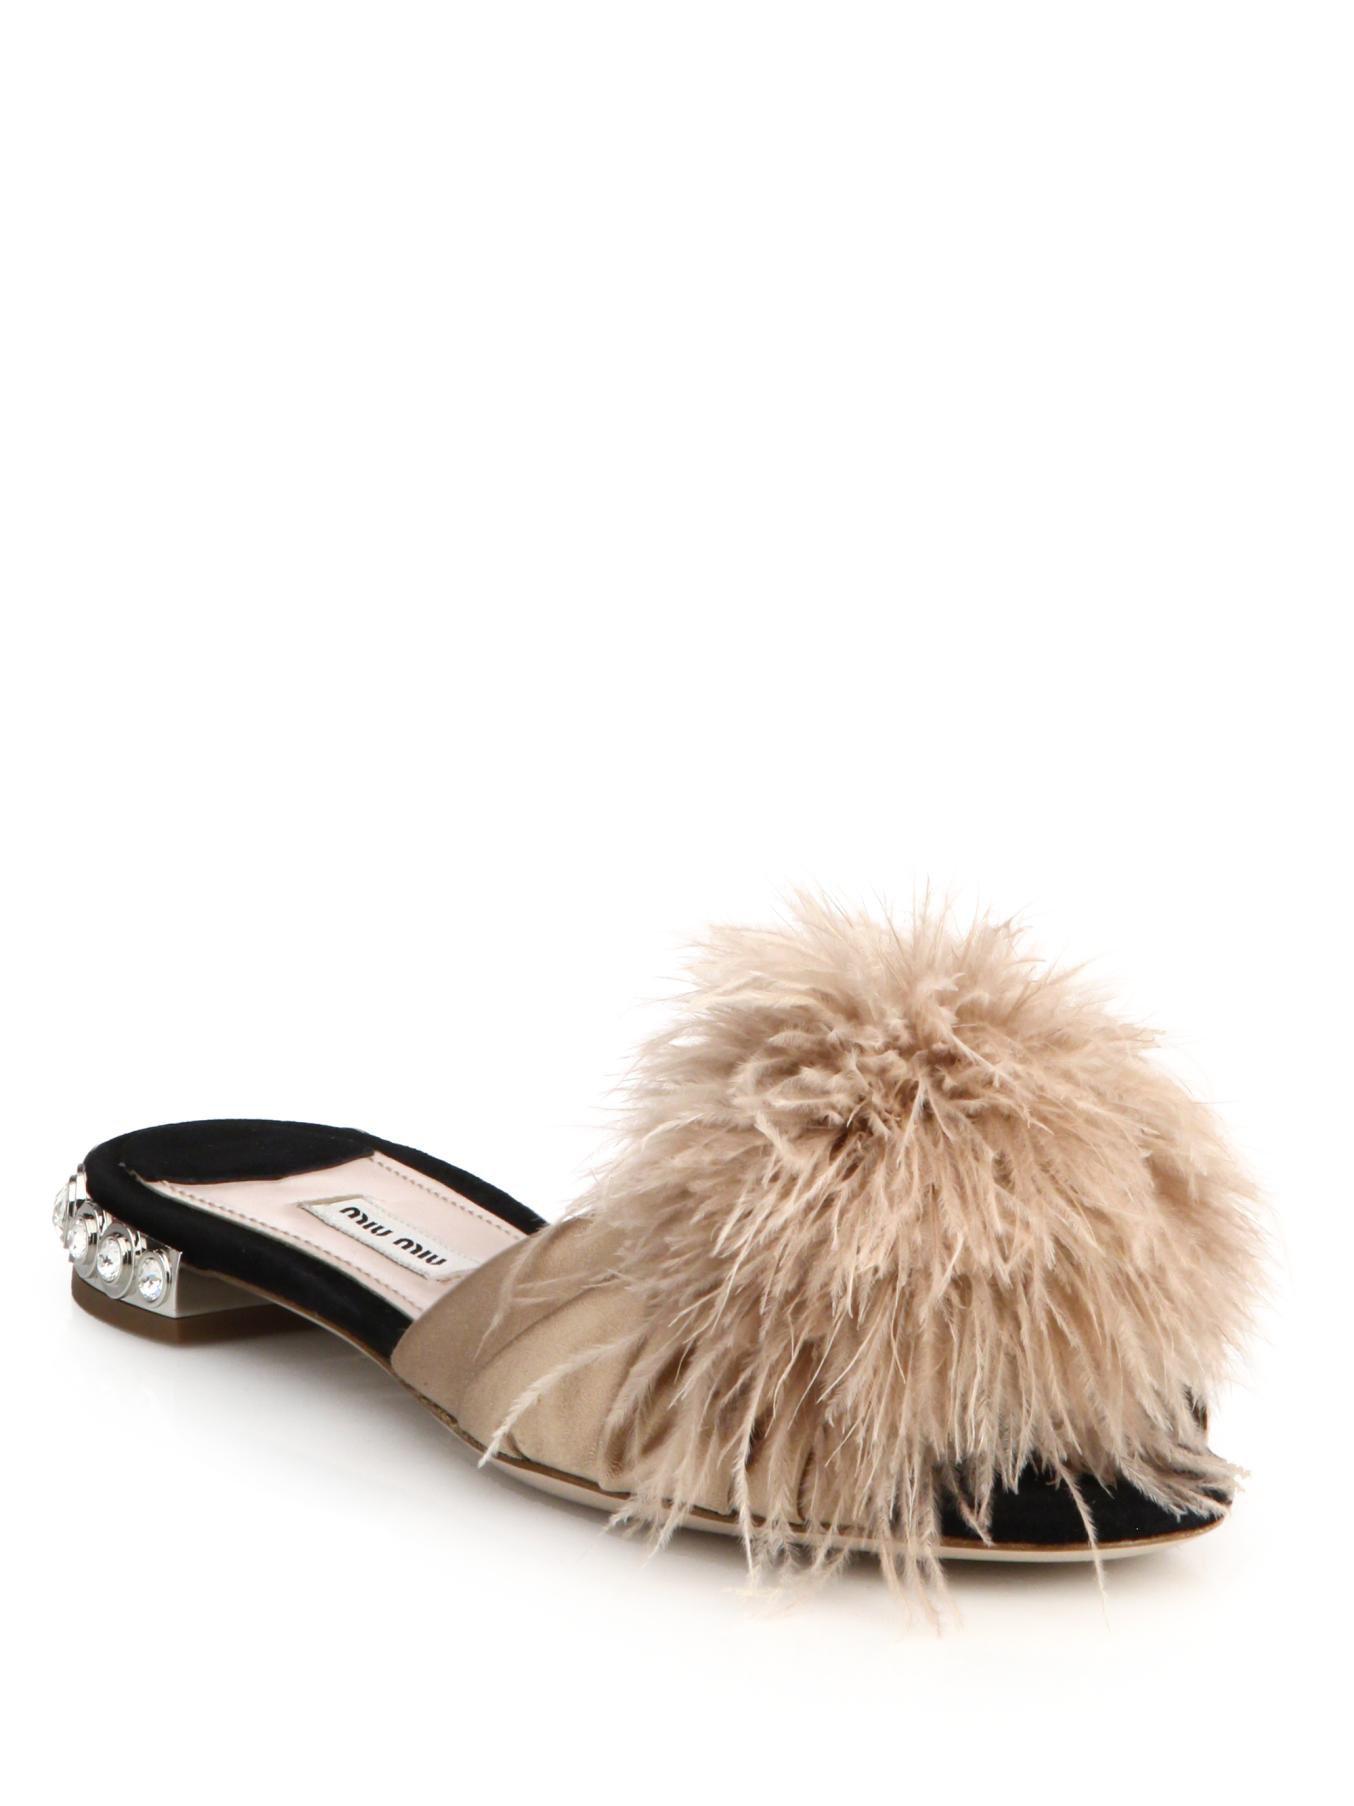 Miu Miu Feather Amp Crystal Embellished Suede Slide Sandals